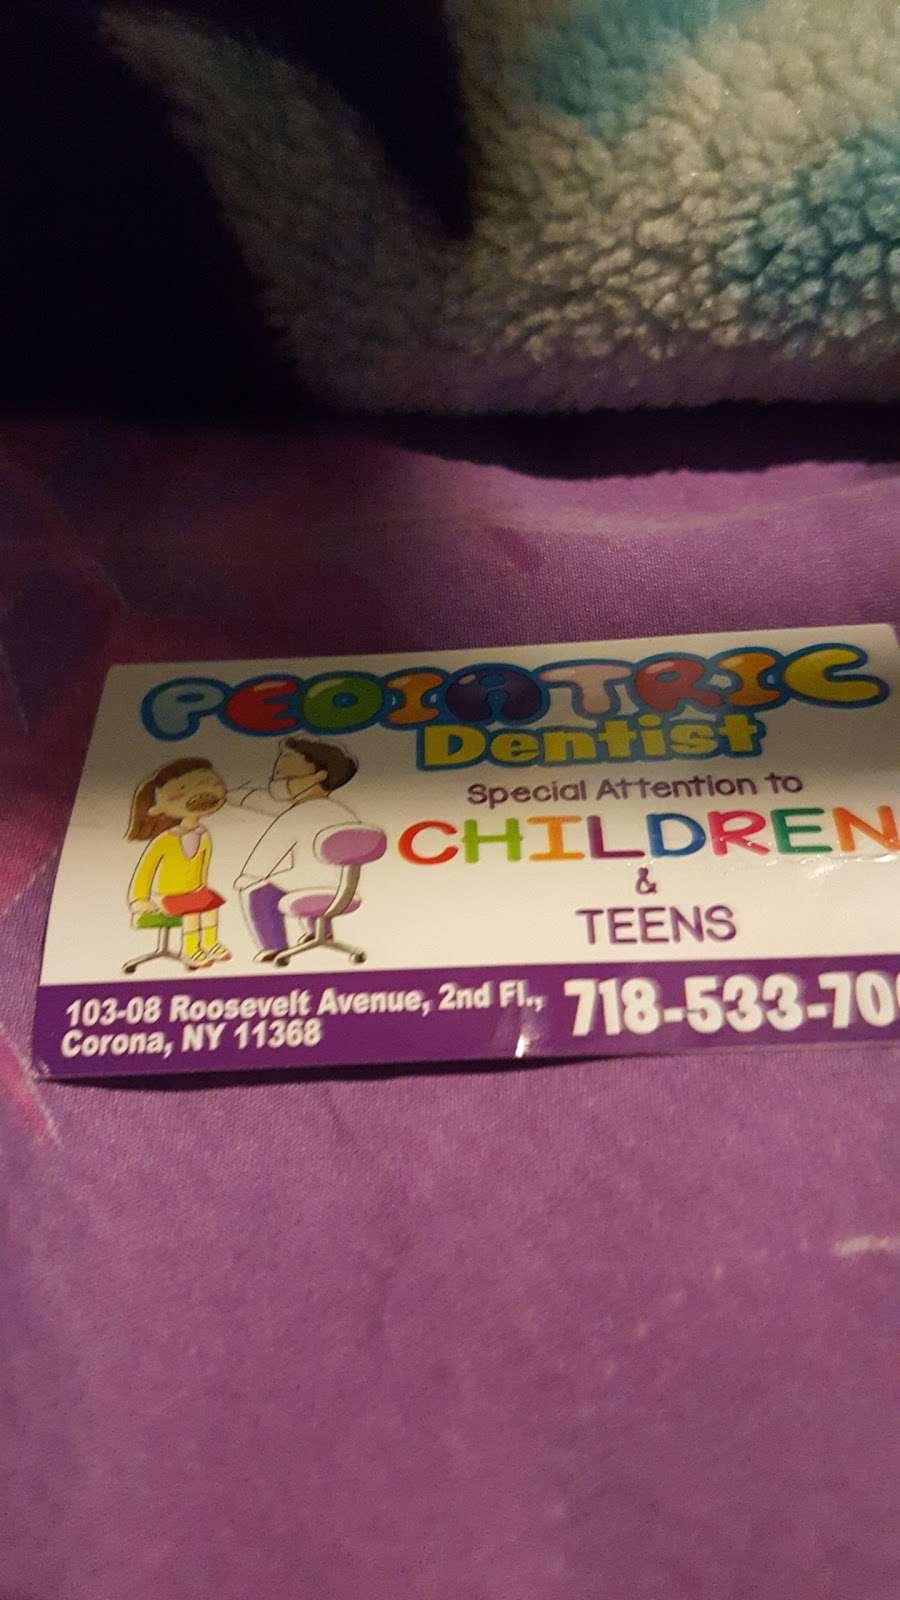 Theresa Lang Childrens Ambulatory Center - hospital  | Photo 2 of 2 | Address: 56-45 Main St, Flushing, NY 11355, USA | Phone: (718) 670-1800